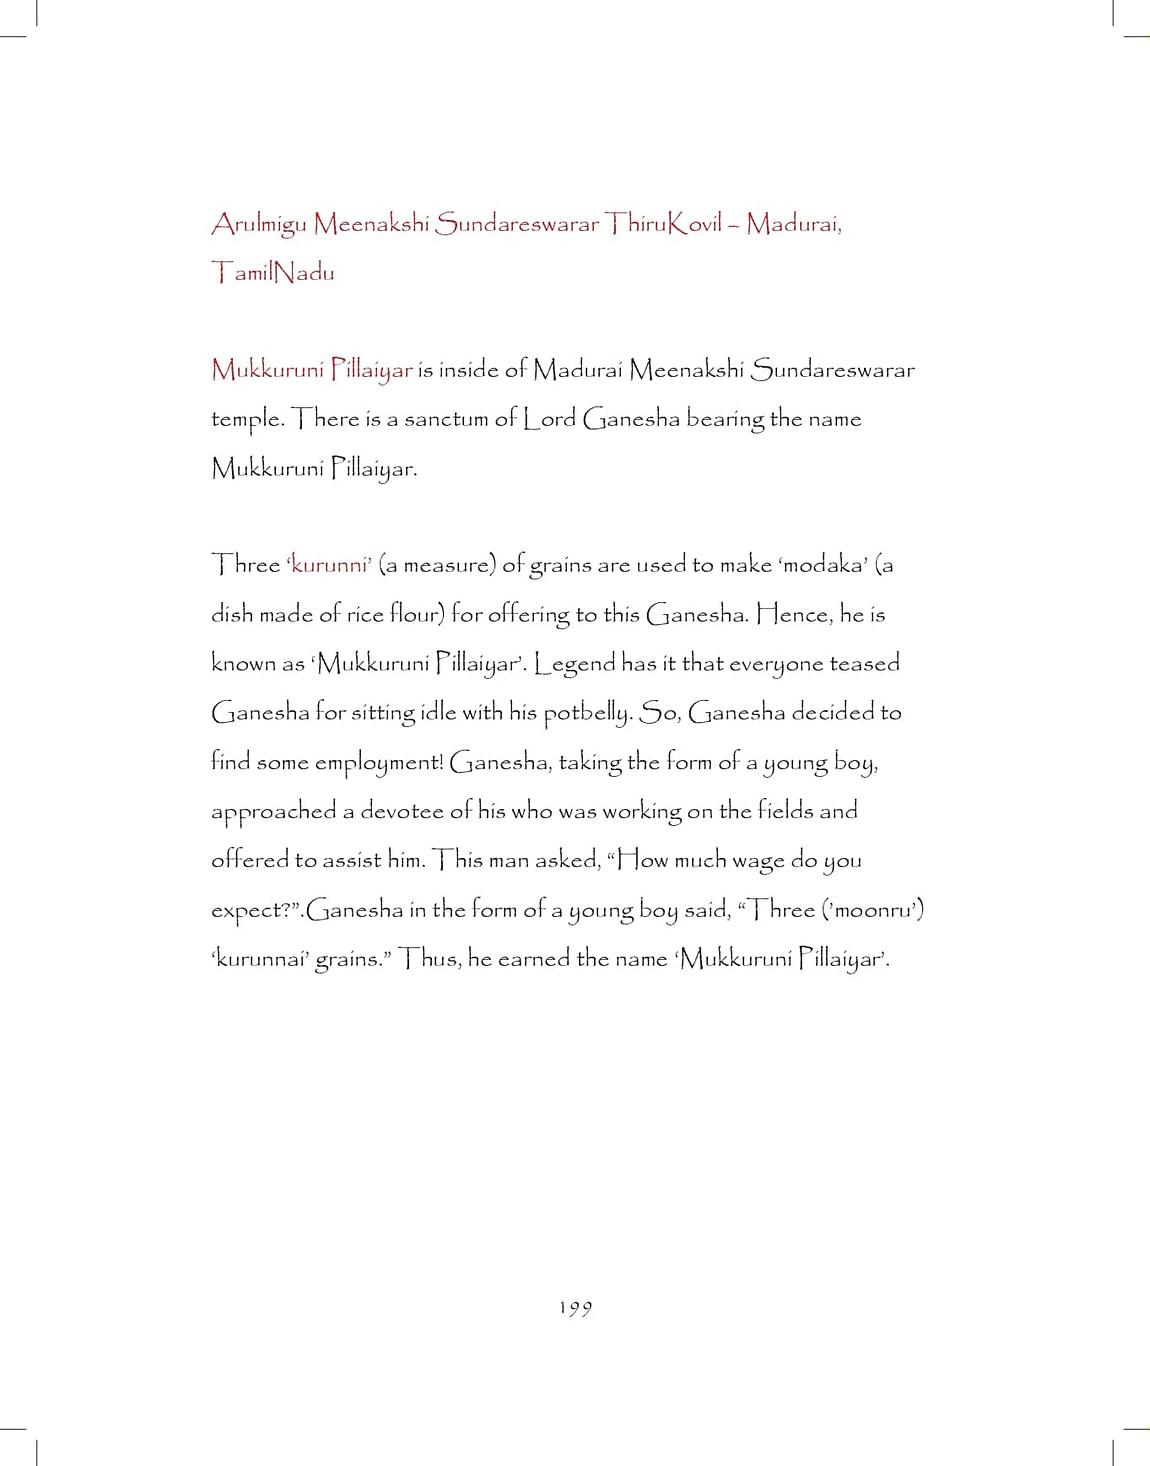 Ganesh-print_pages-to-jpg-0199.jpg